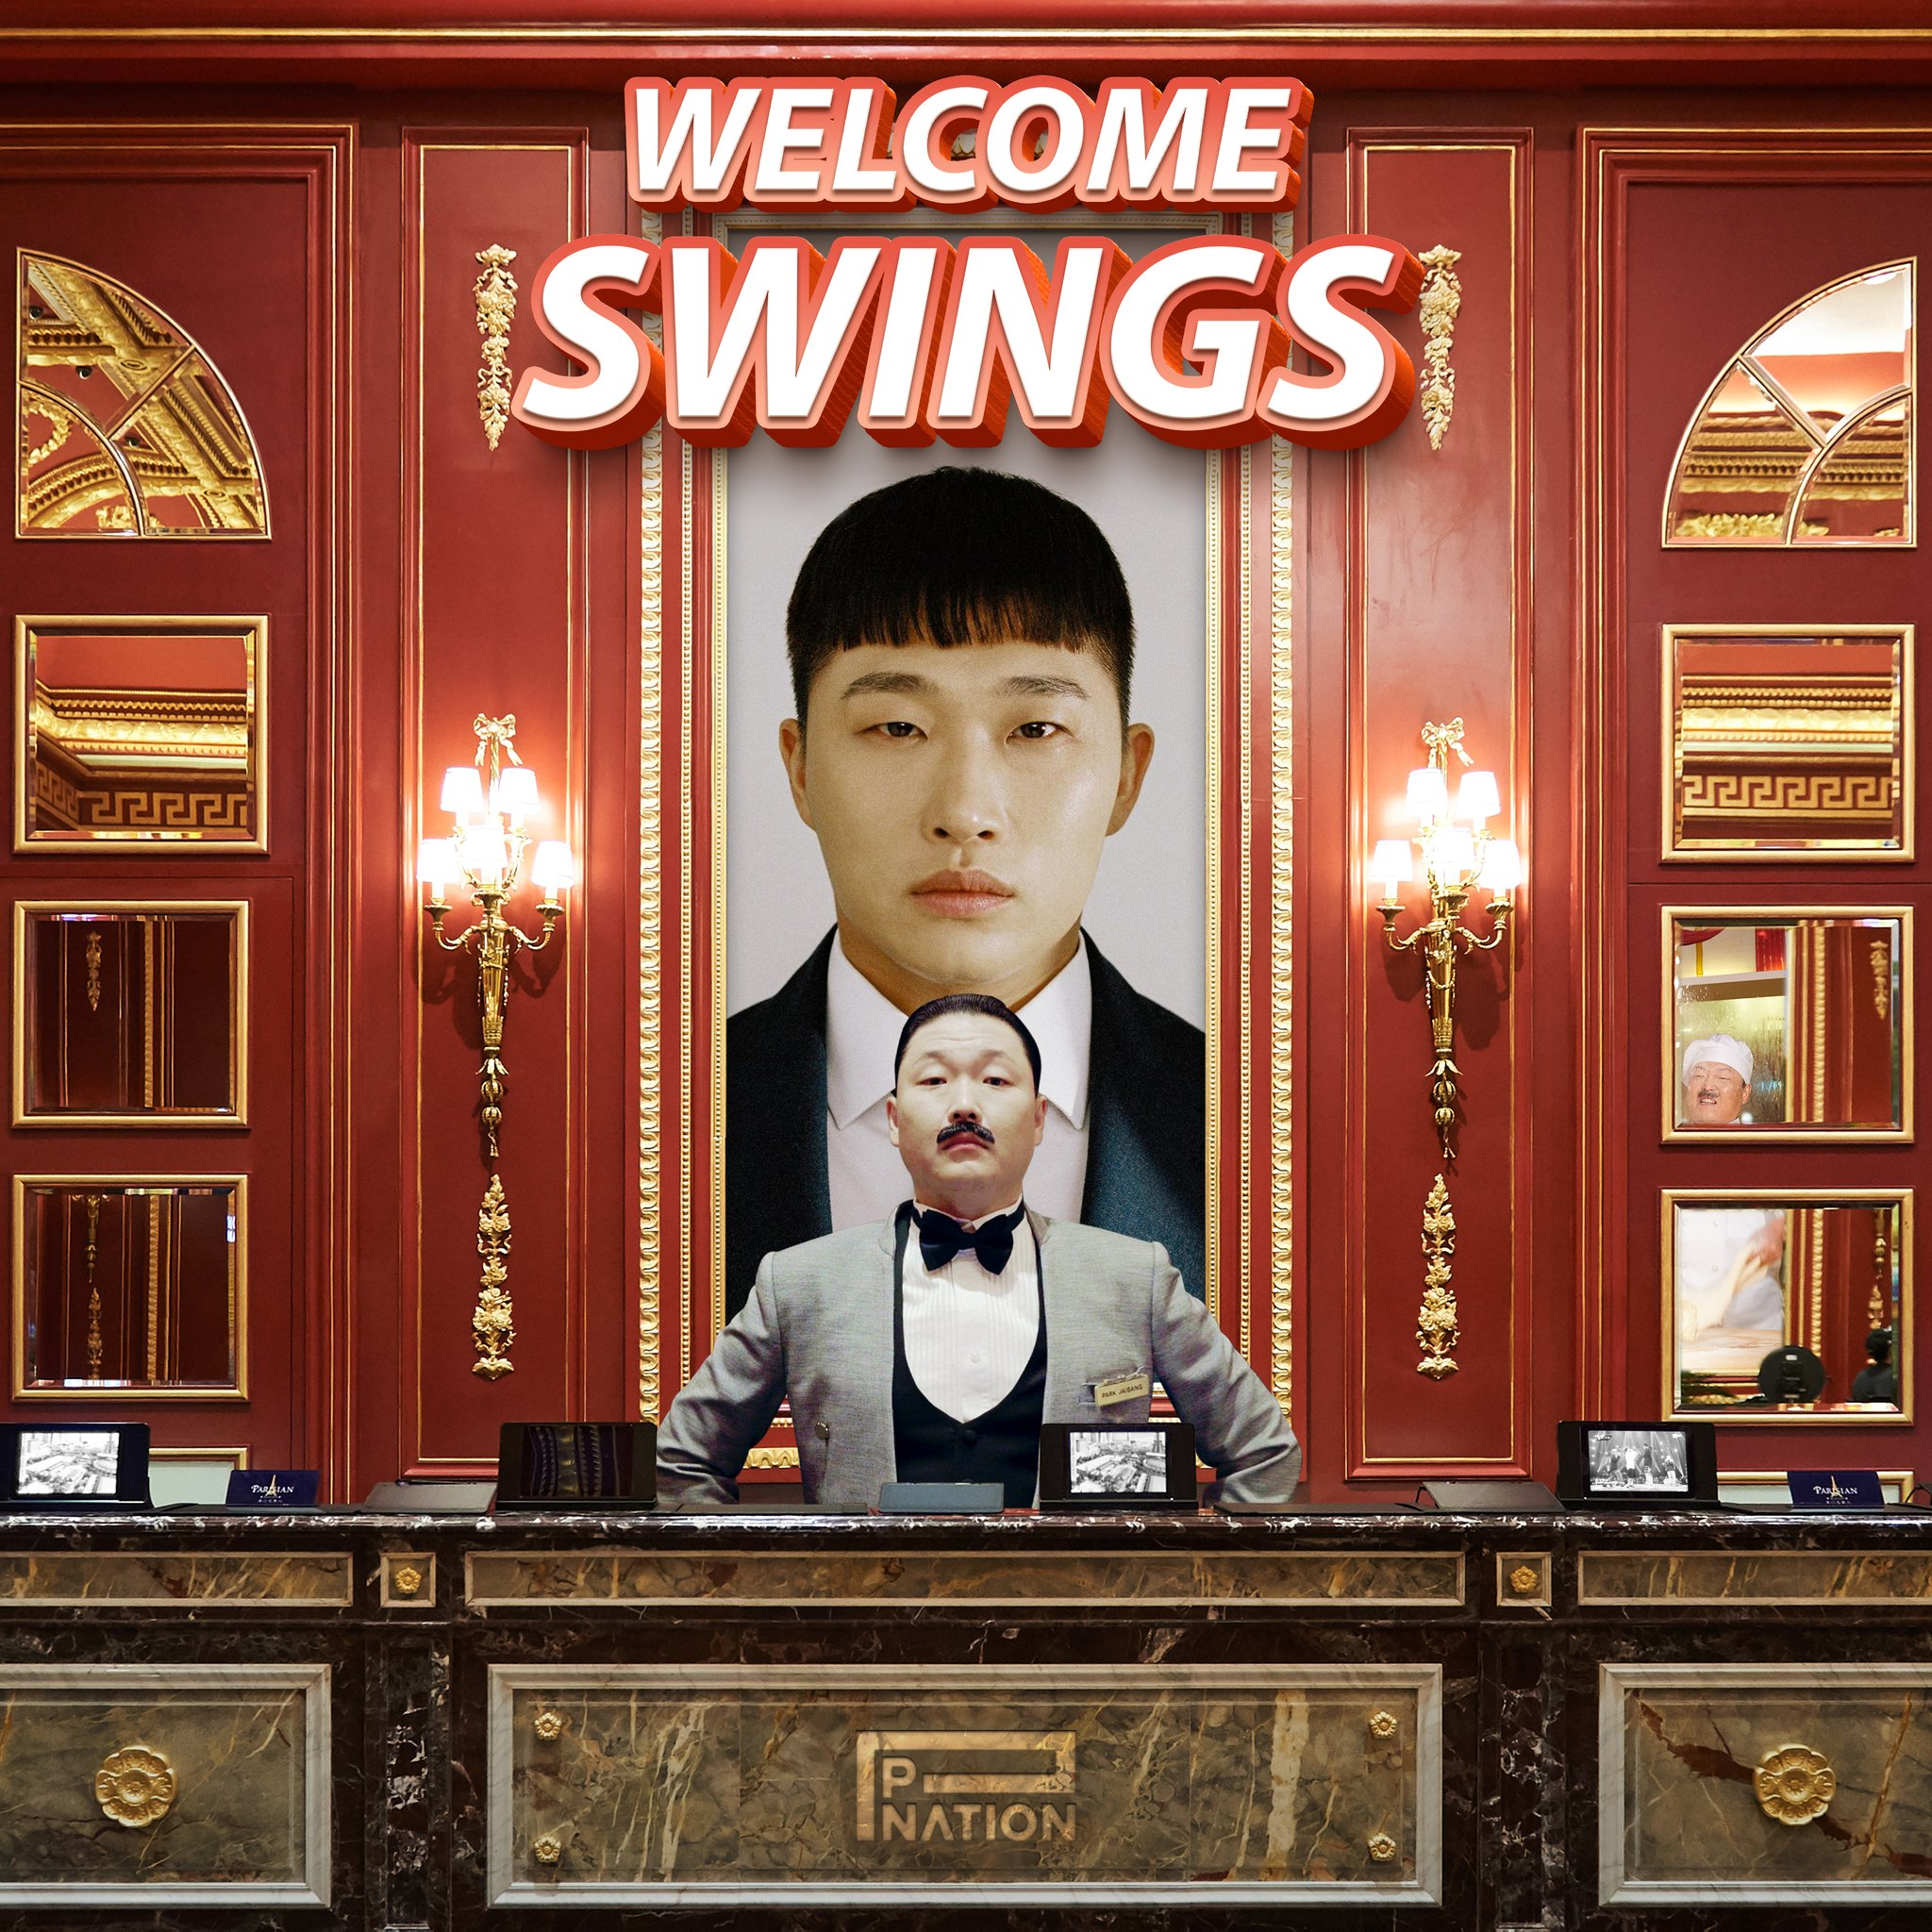 swings2